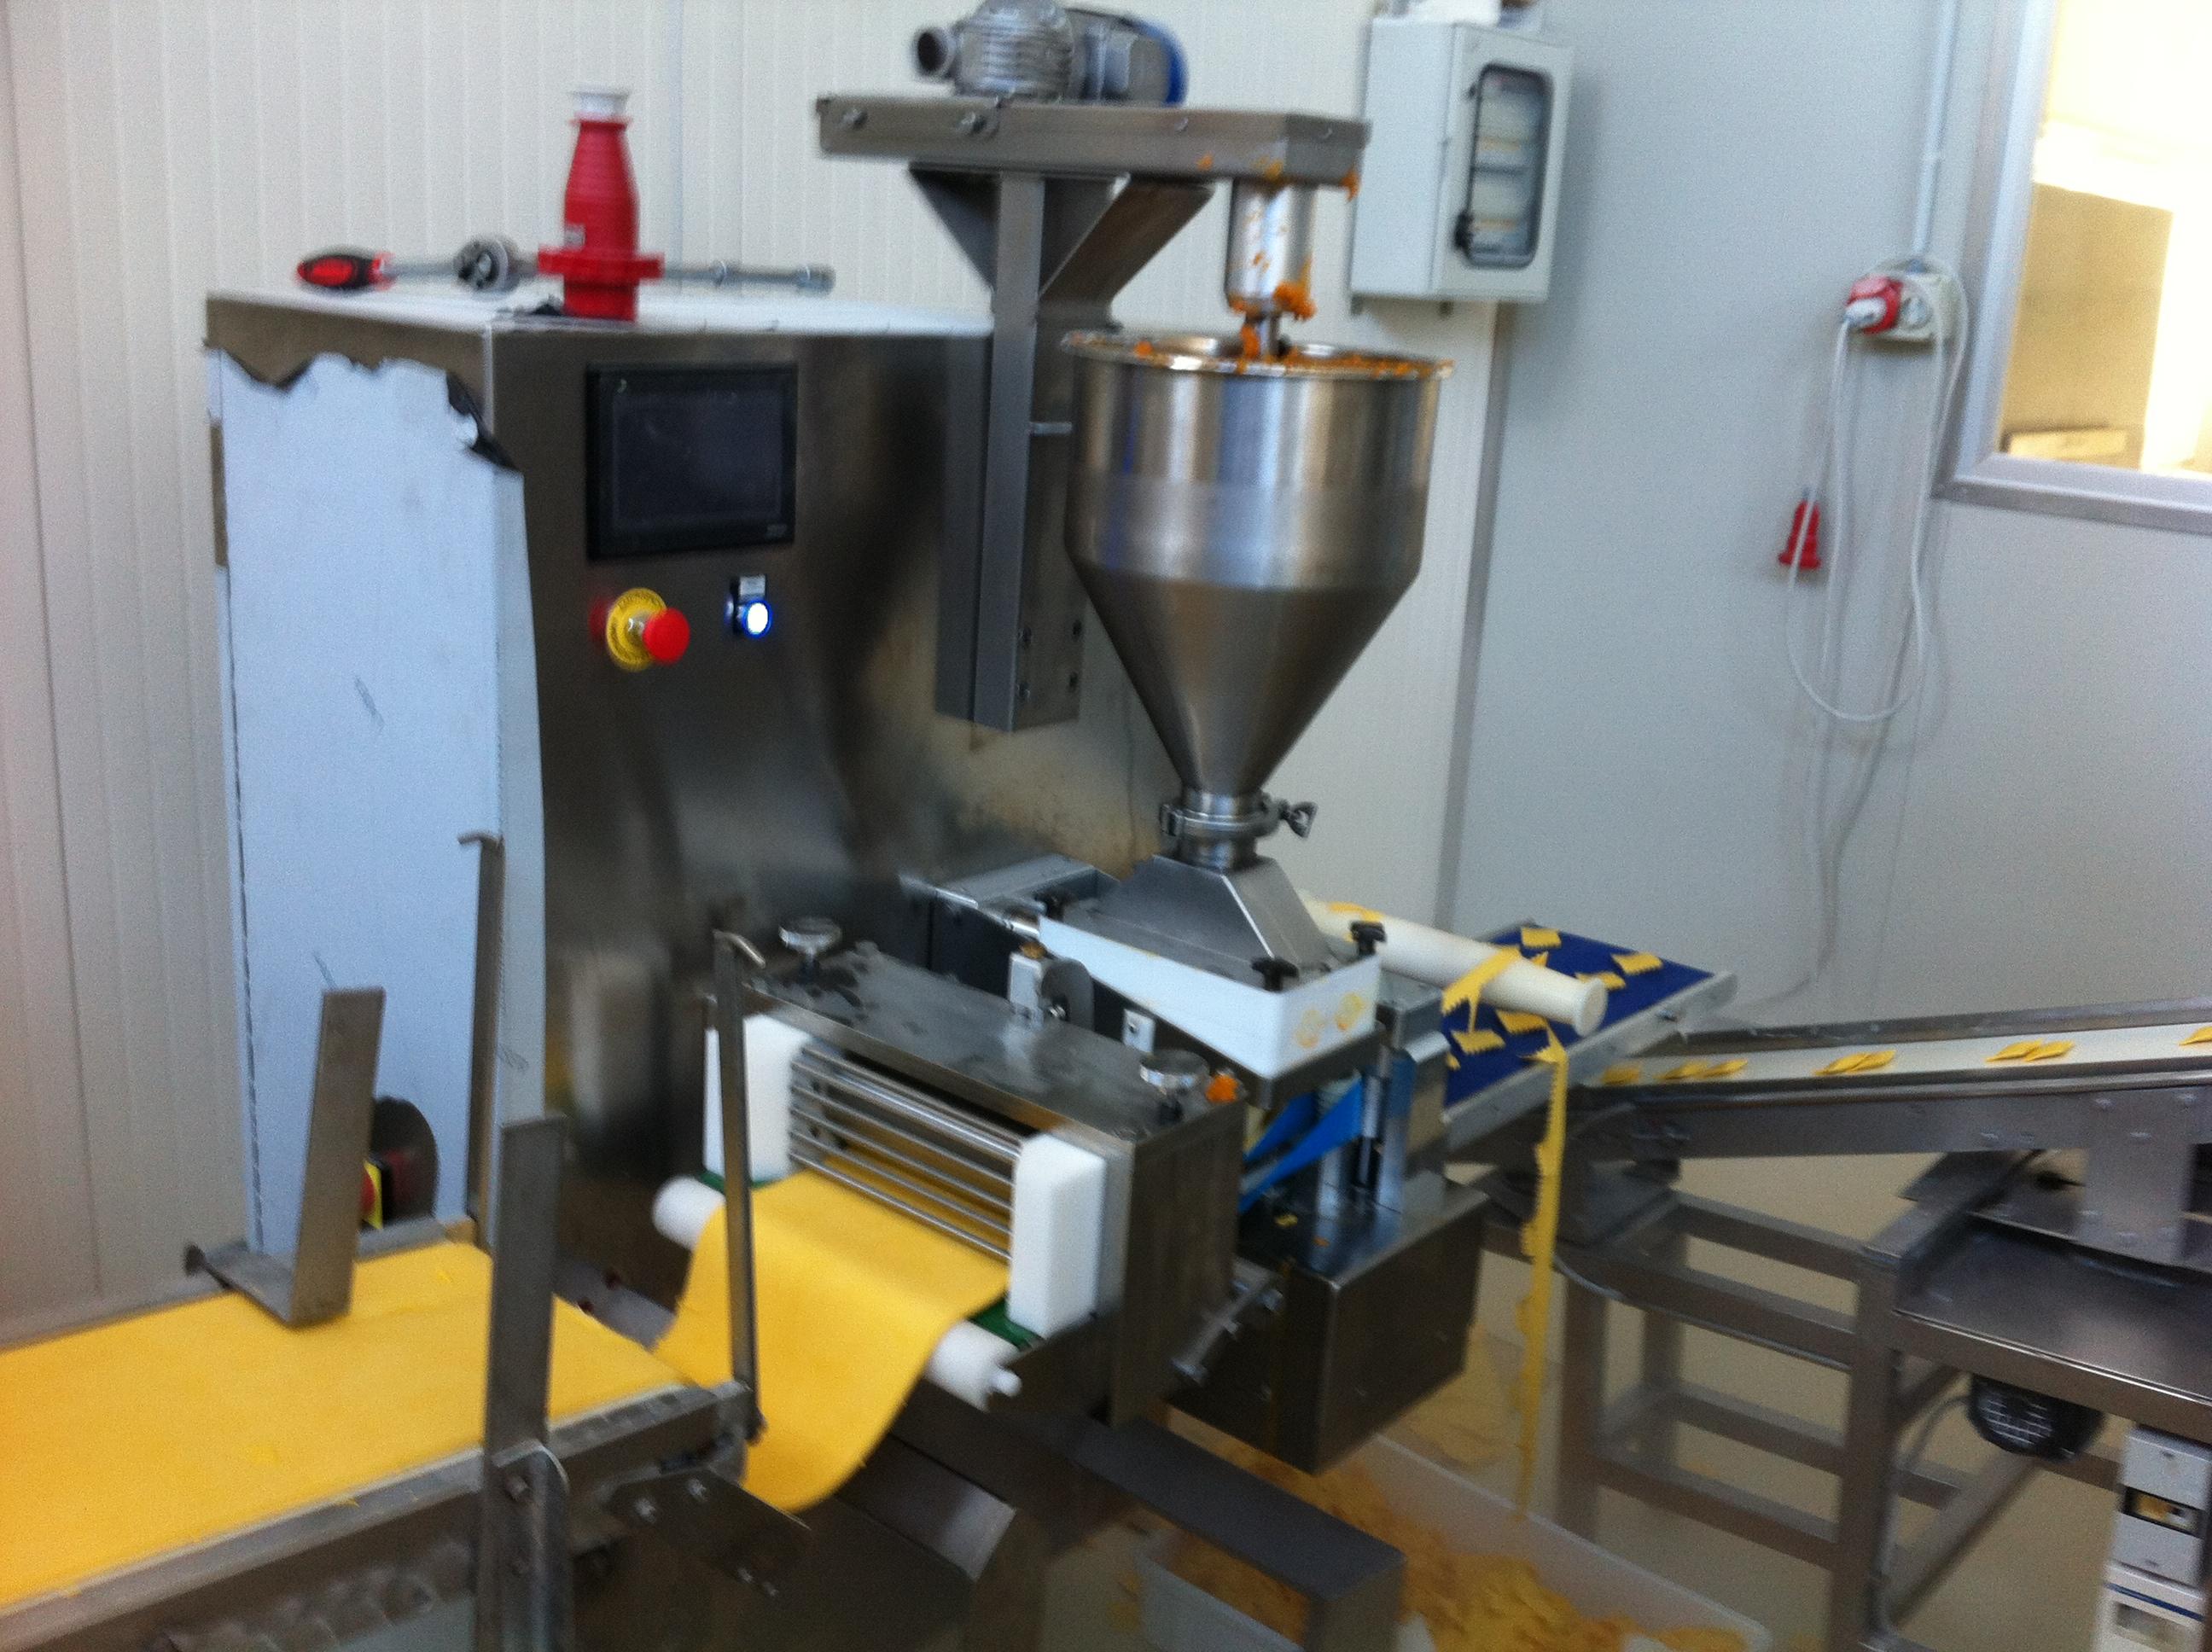 Idea pasta machines idea pasta machines macchine per la - Macchine per la pasta casalinga ...